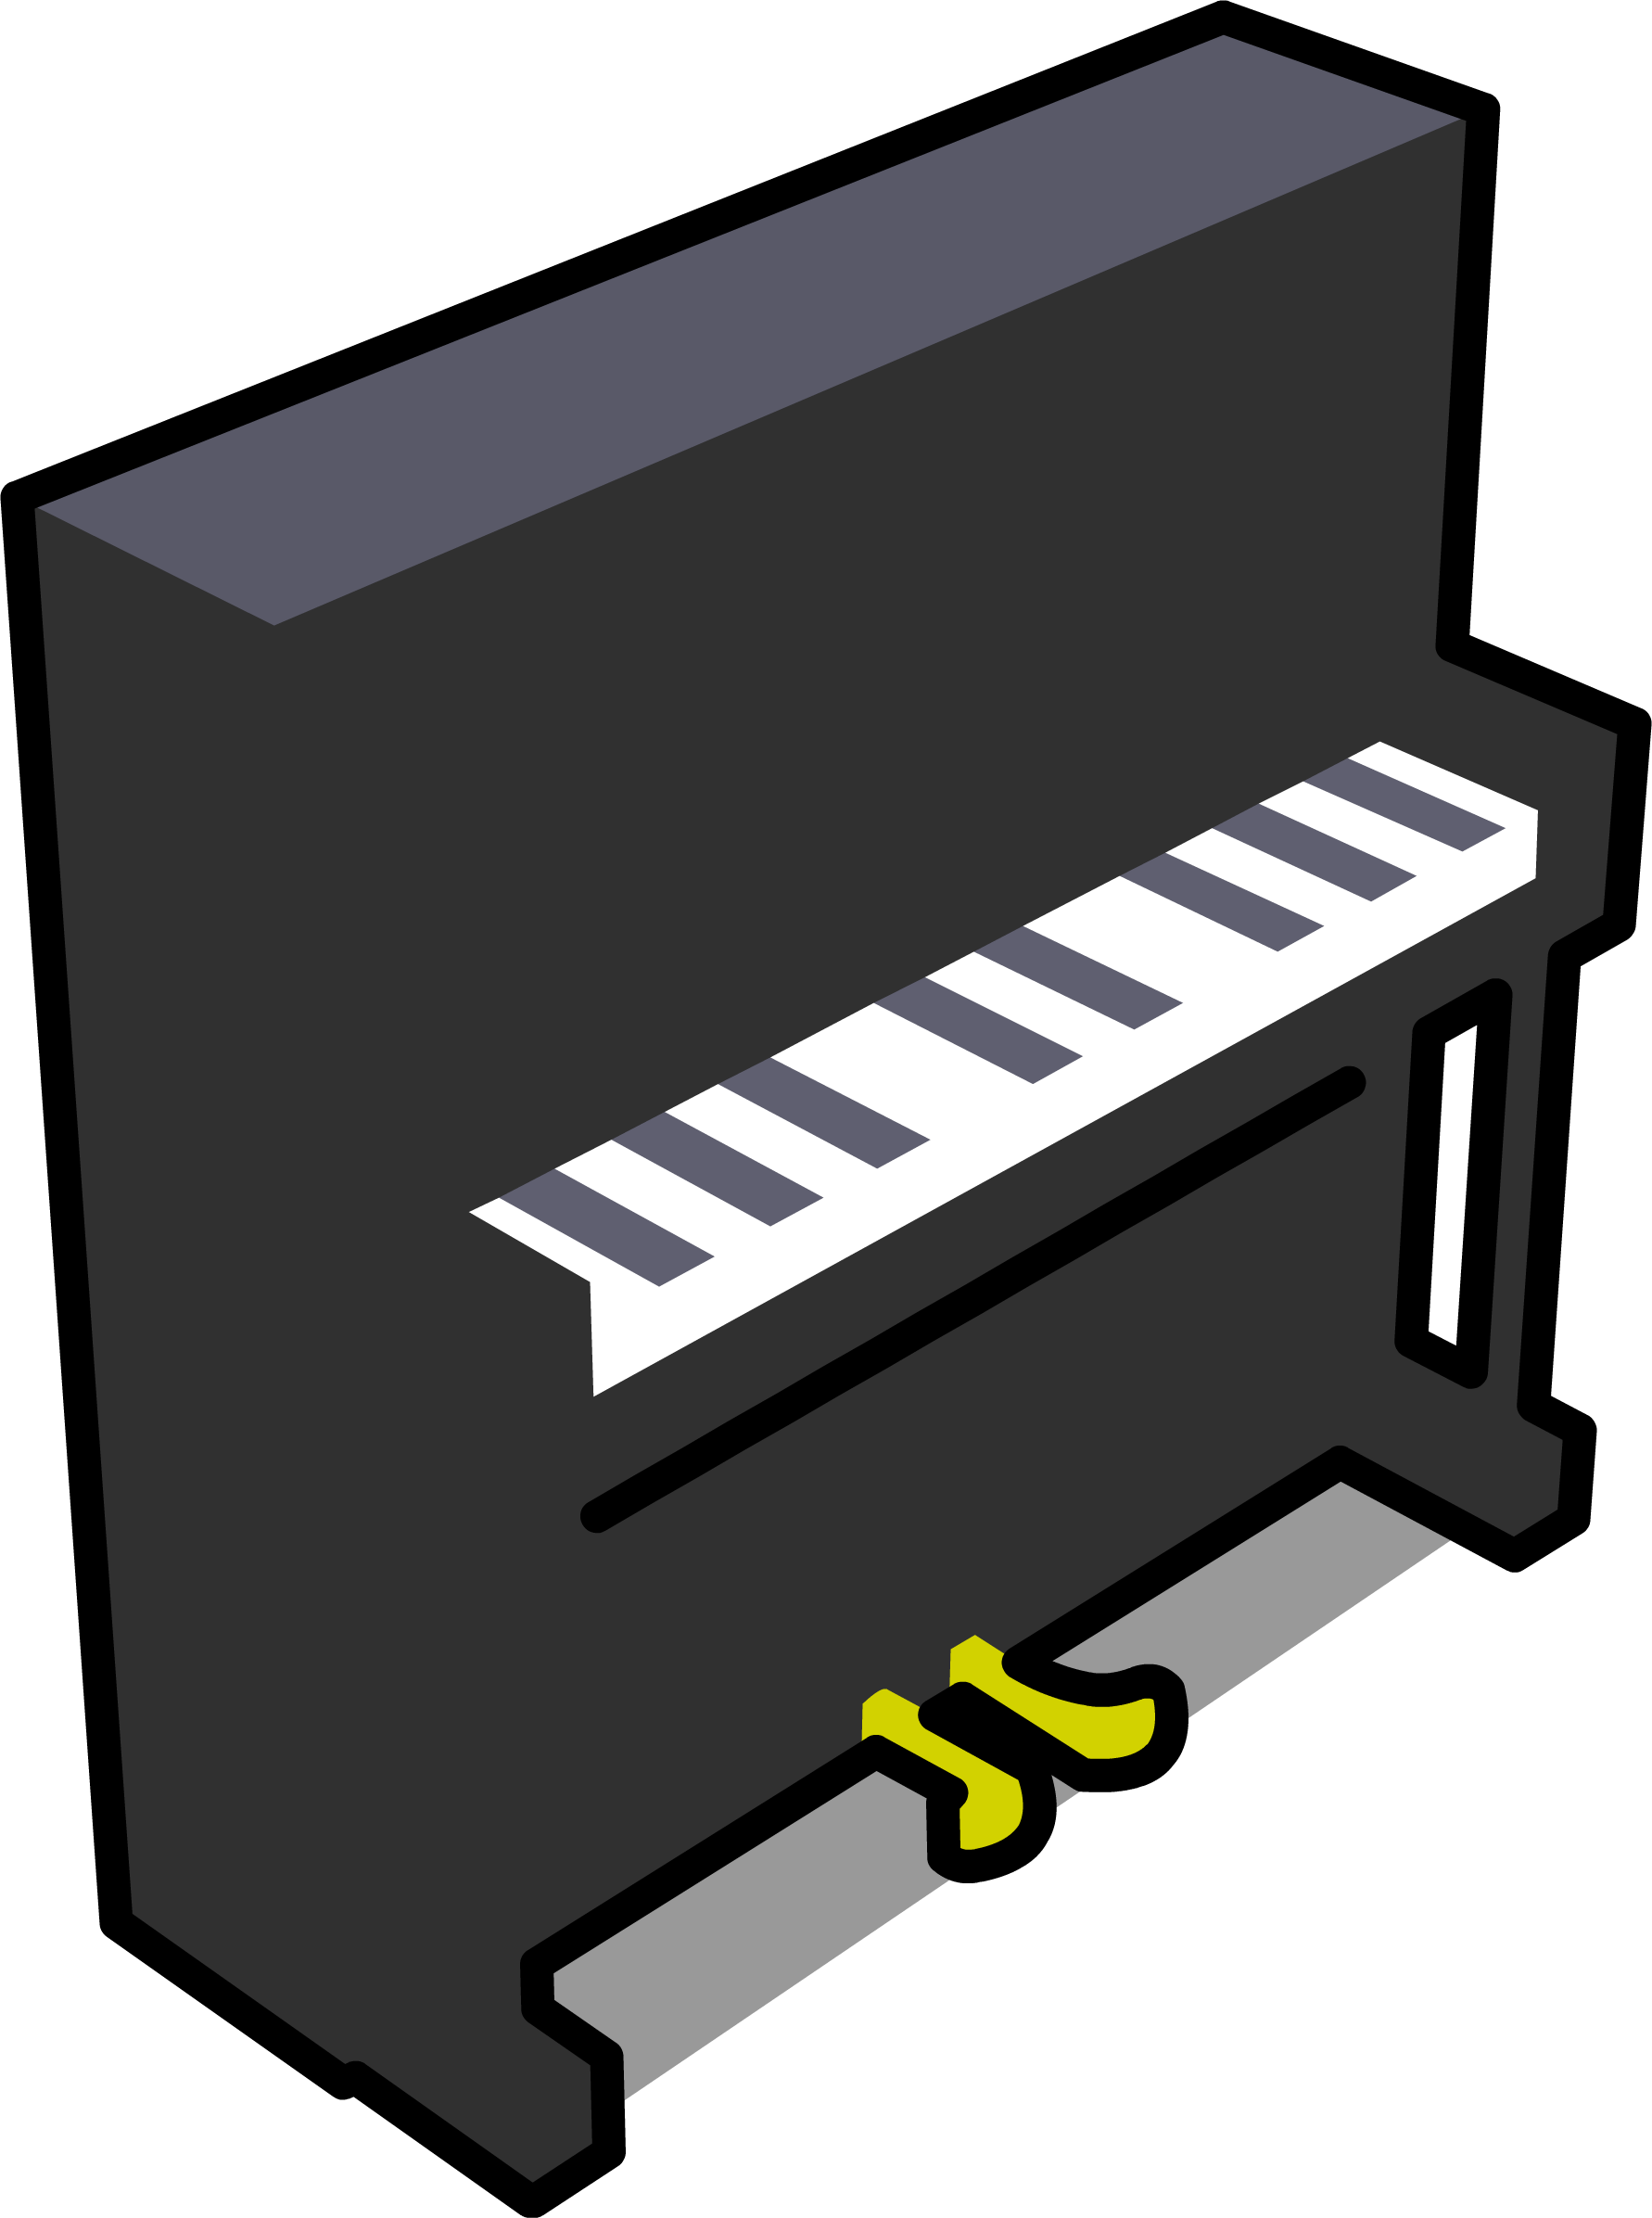 Image sprite png club. Piano clipart upright piano